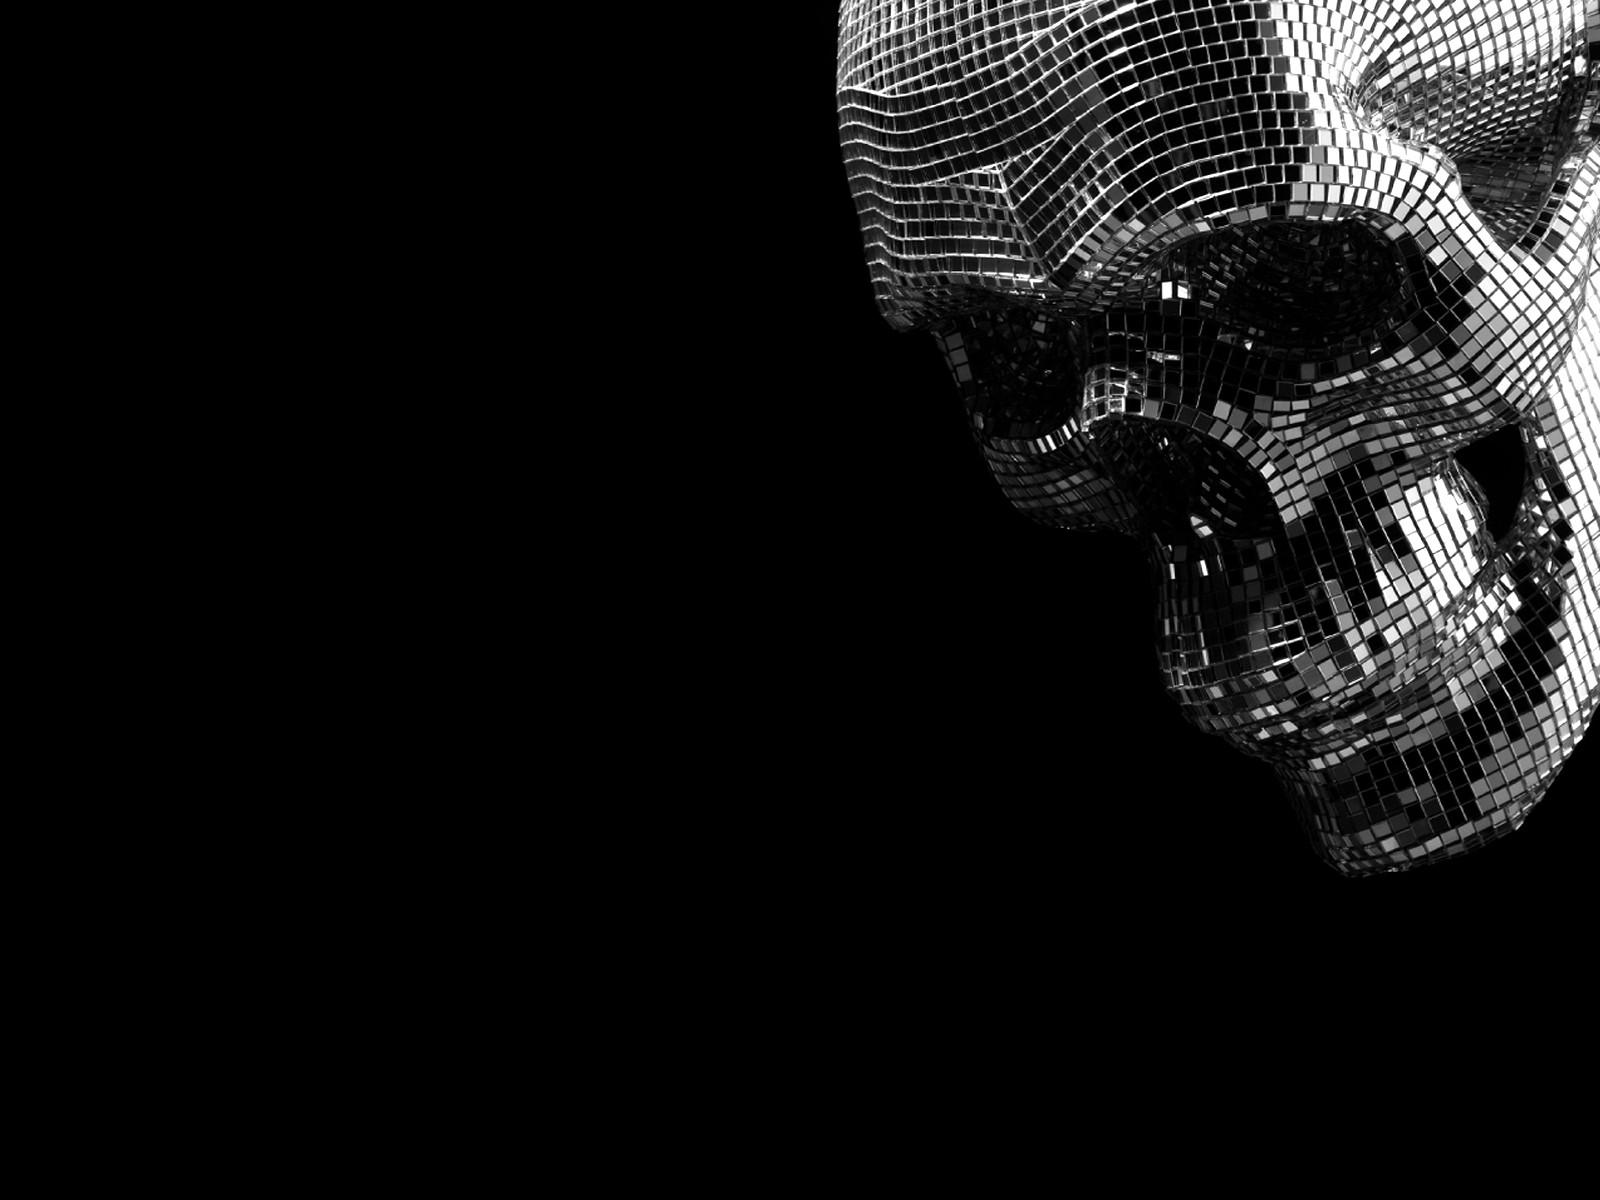 Skull Wallpaper High Definition Photos HD 248 Backgrounds